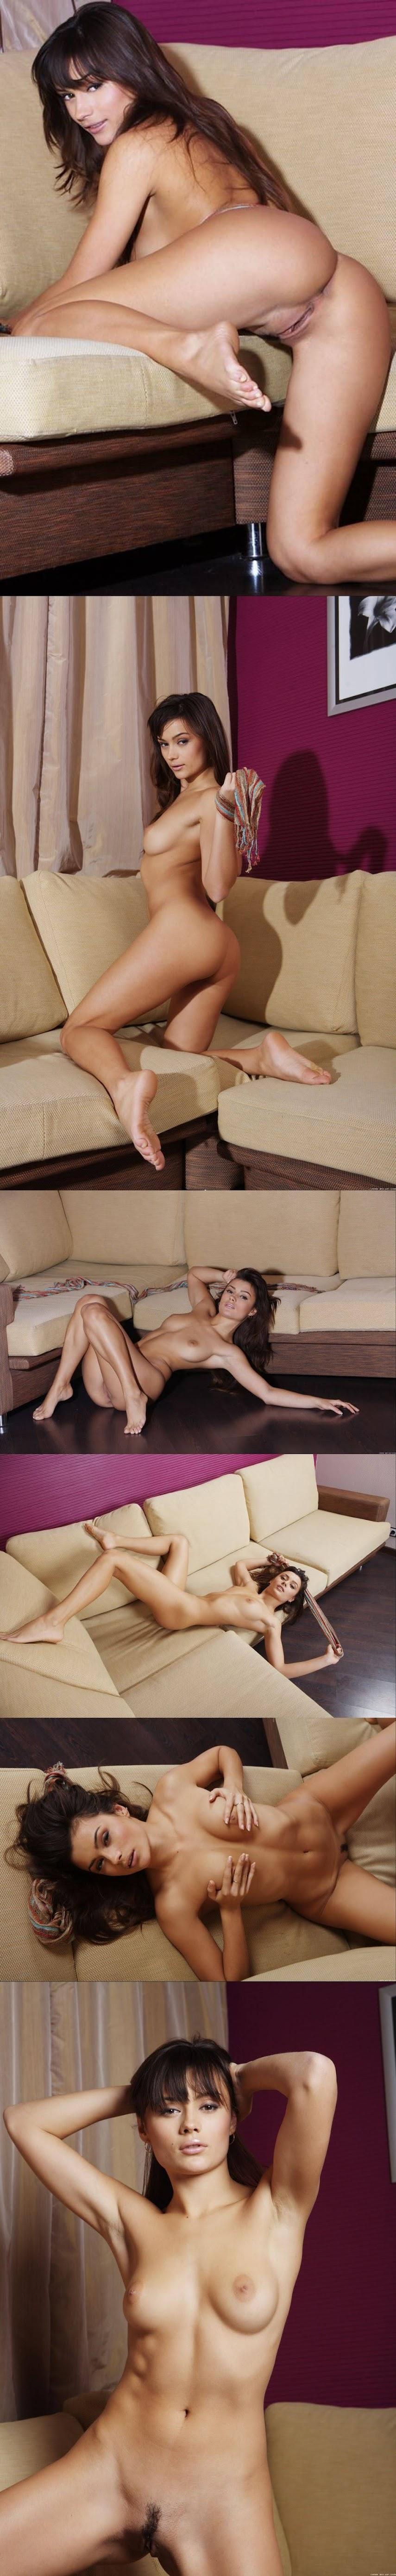 MA_20080830_-_Atena_A_-_Secikias_-_by_Alexander_Voronin.zip-jk- Met-Art MA 20080830 - Melisa B - Presenting - by Dolce